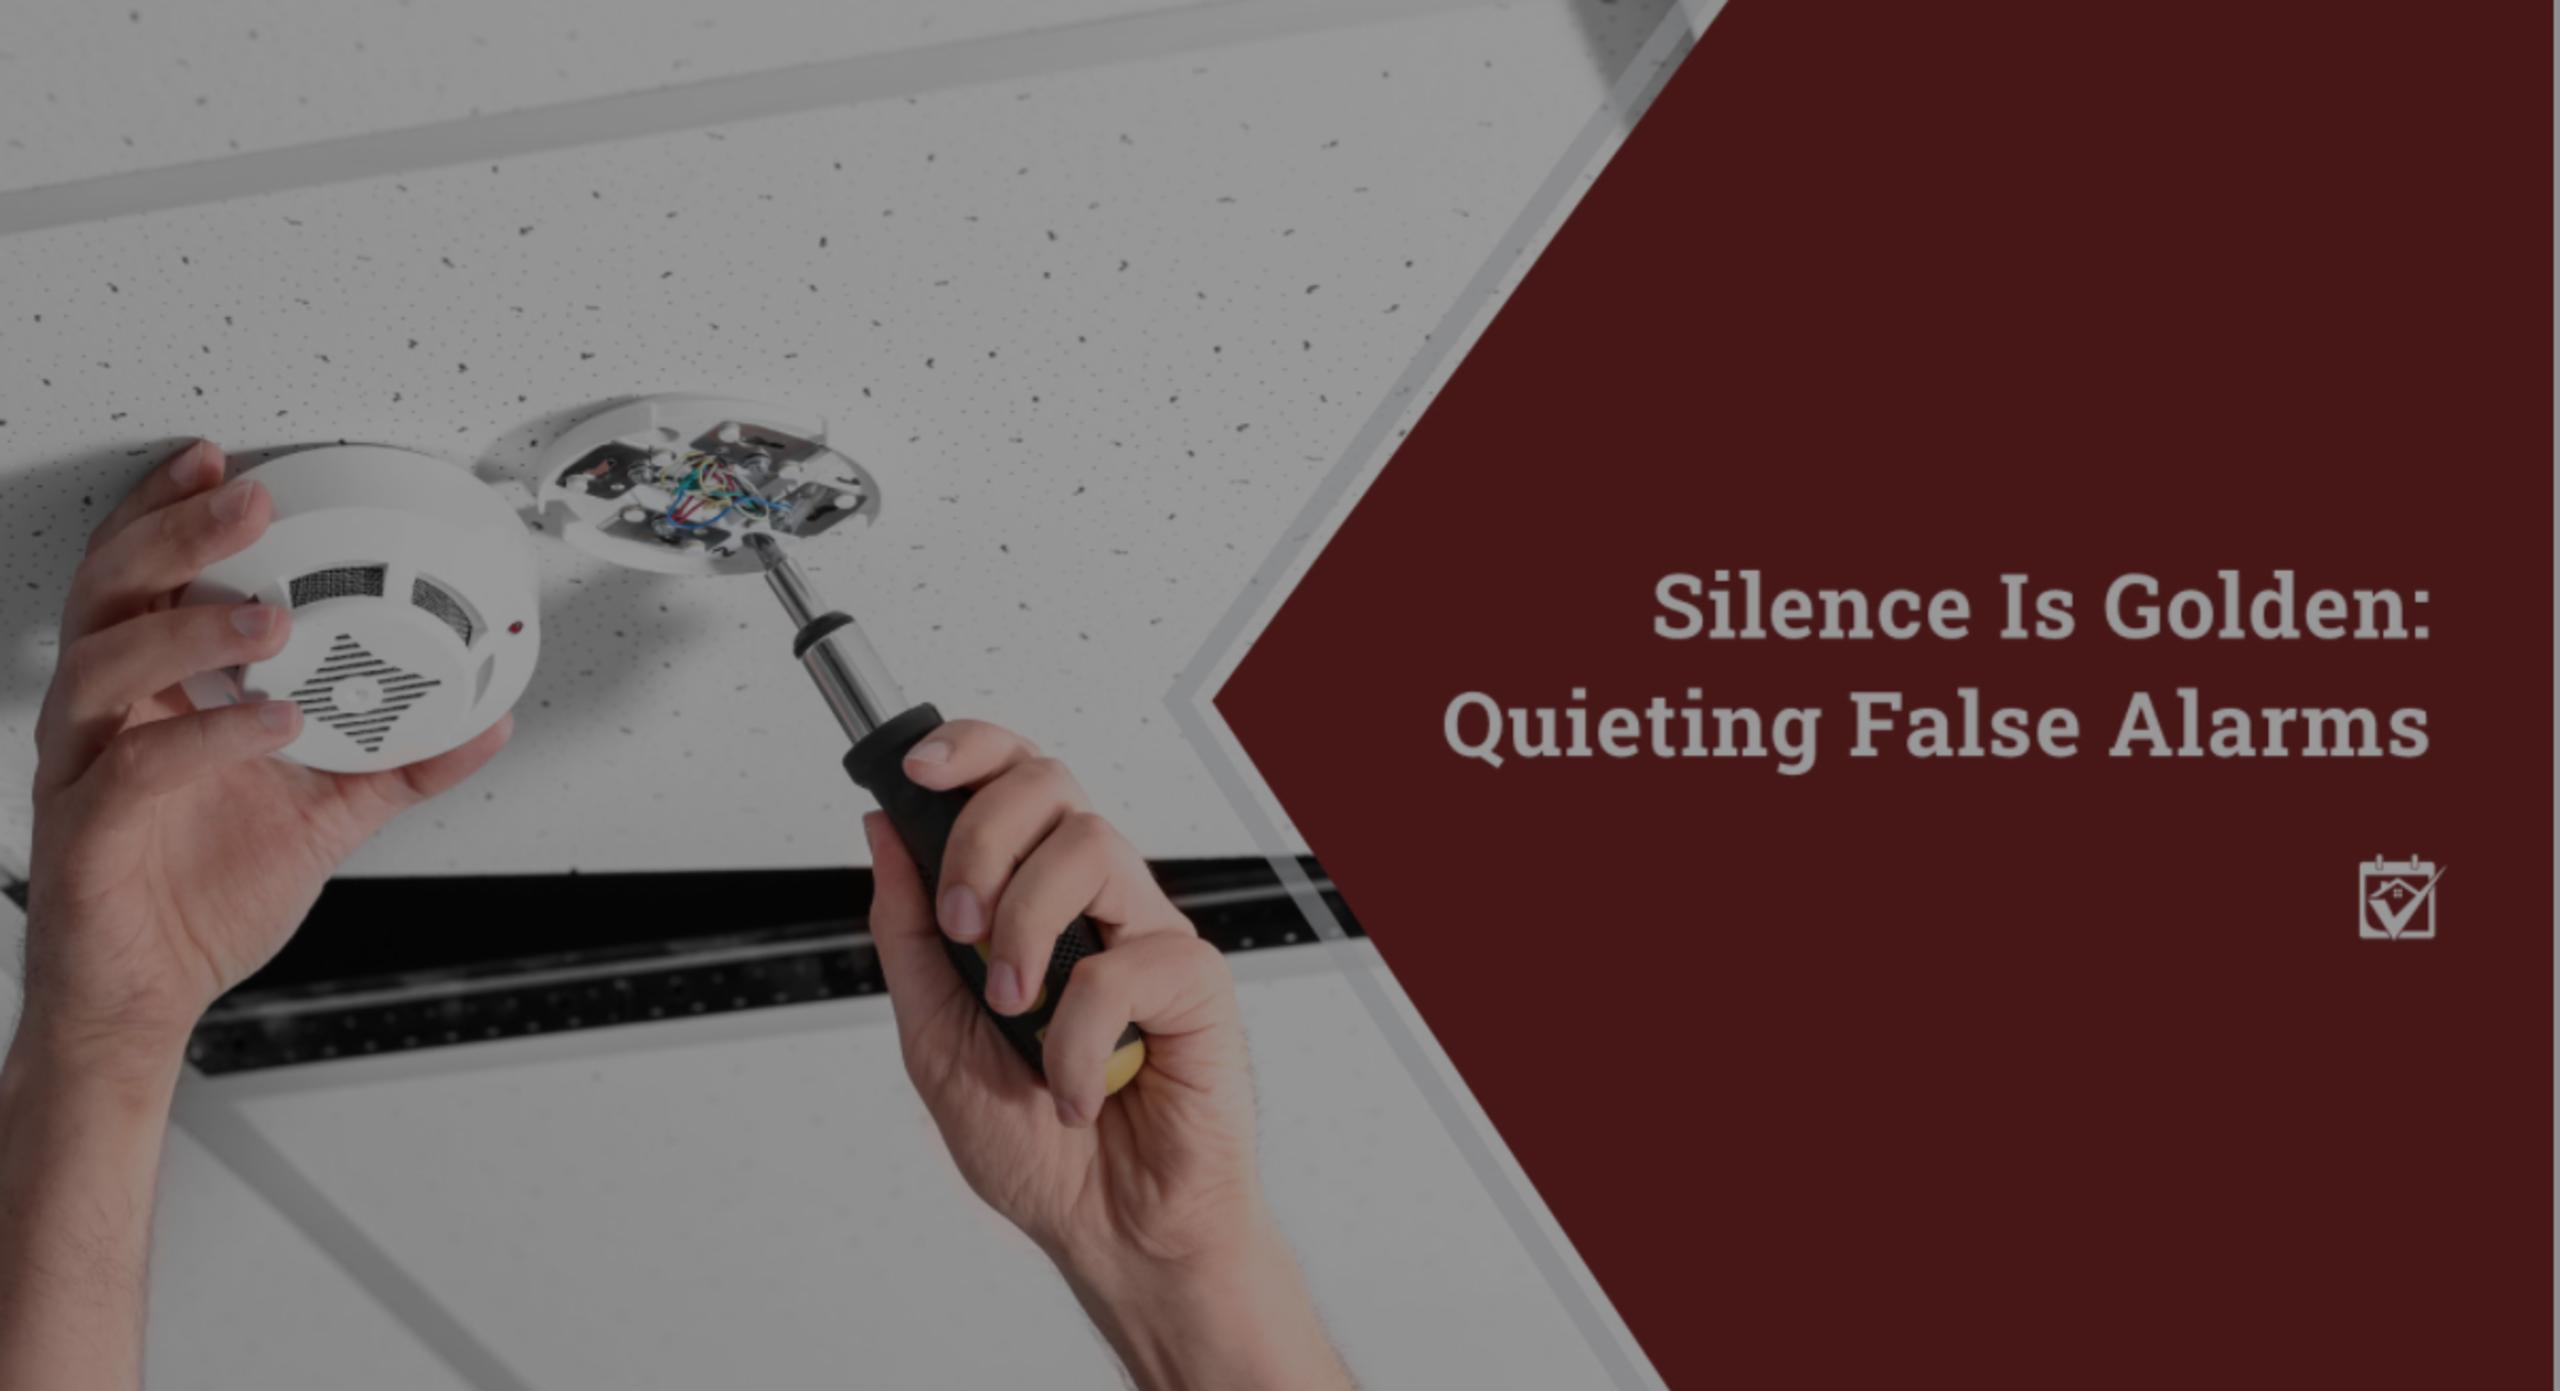 Silence Is Golden: Quieting False Alarms